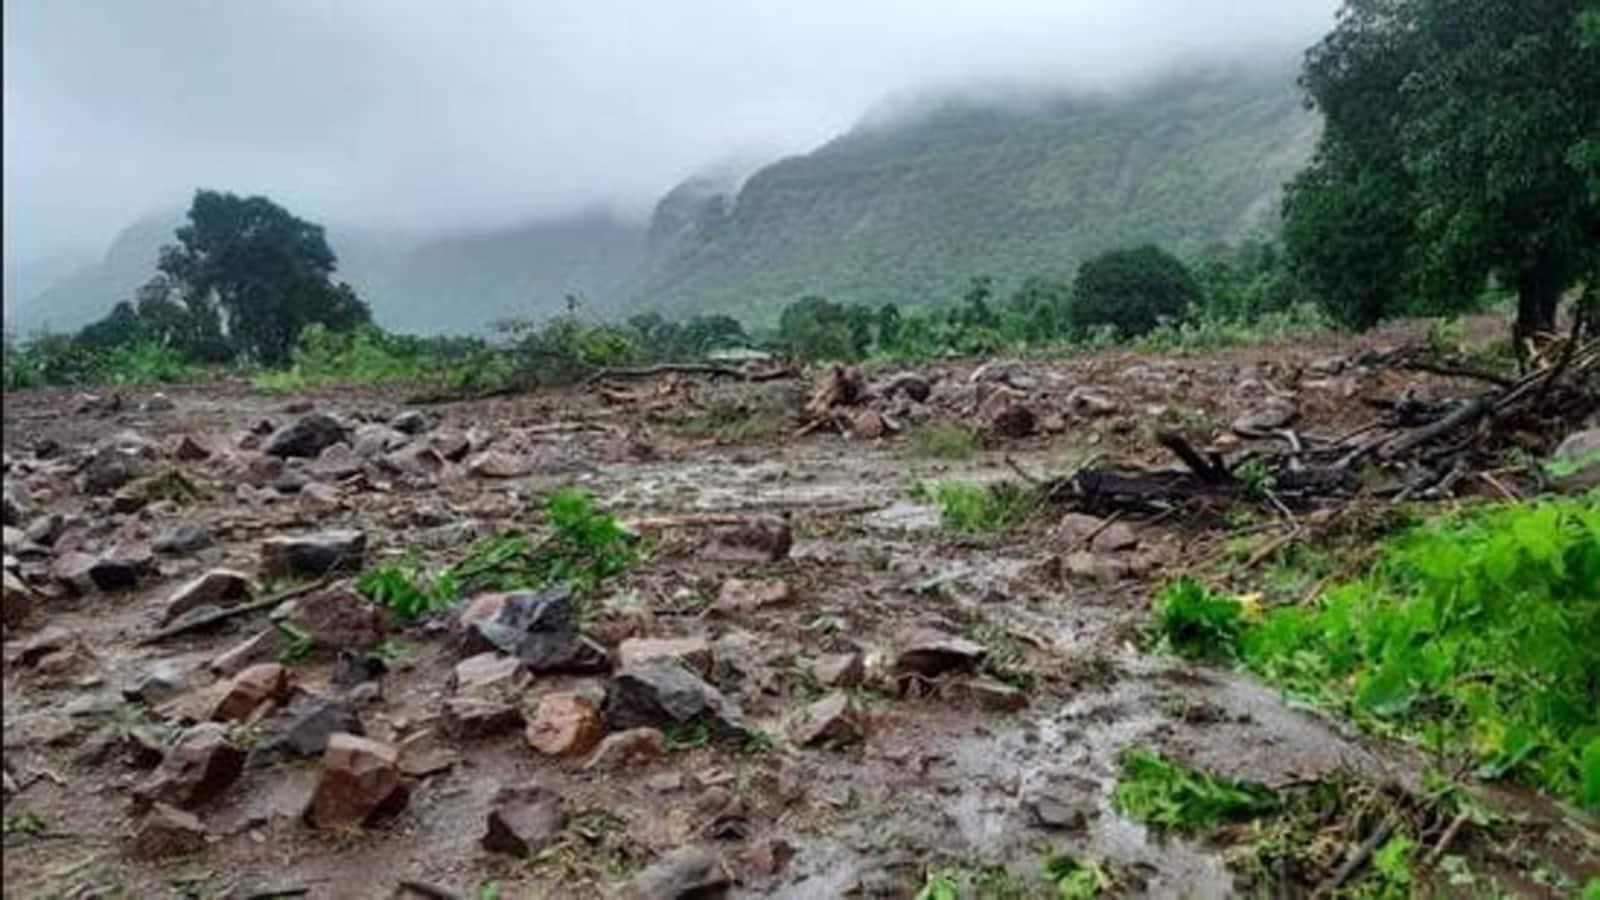 Karnataka floods: 9 lifeless, 3 lacking in disaster-hit areas, says minister